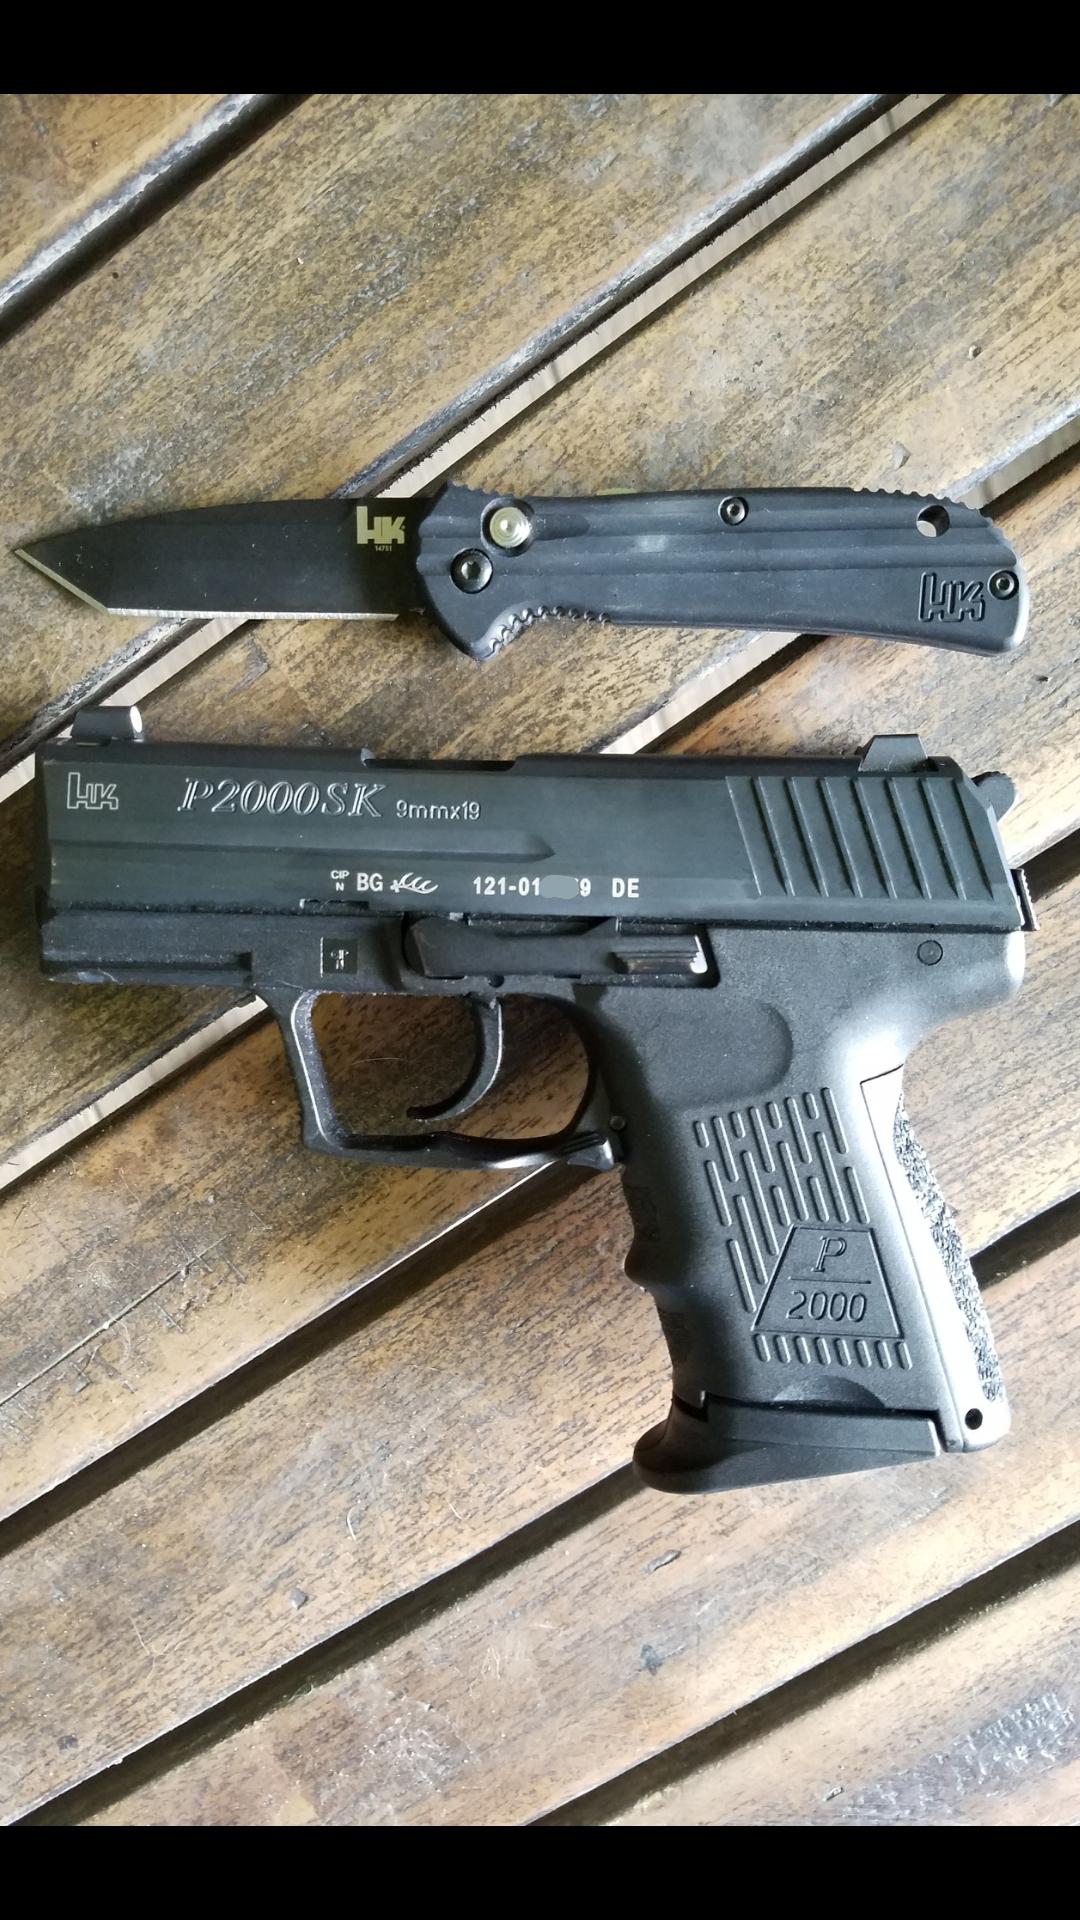 The 9mm Pistol Photo Thread-screenshot_20200409-194312_gallery_1586479438044.jpg